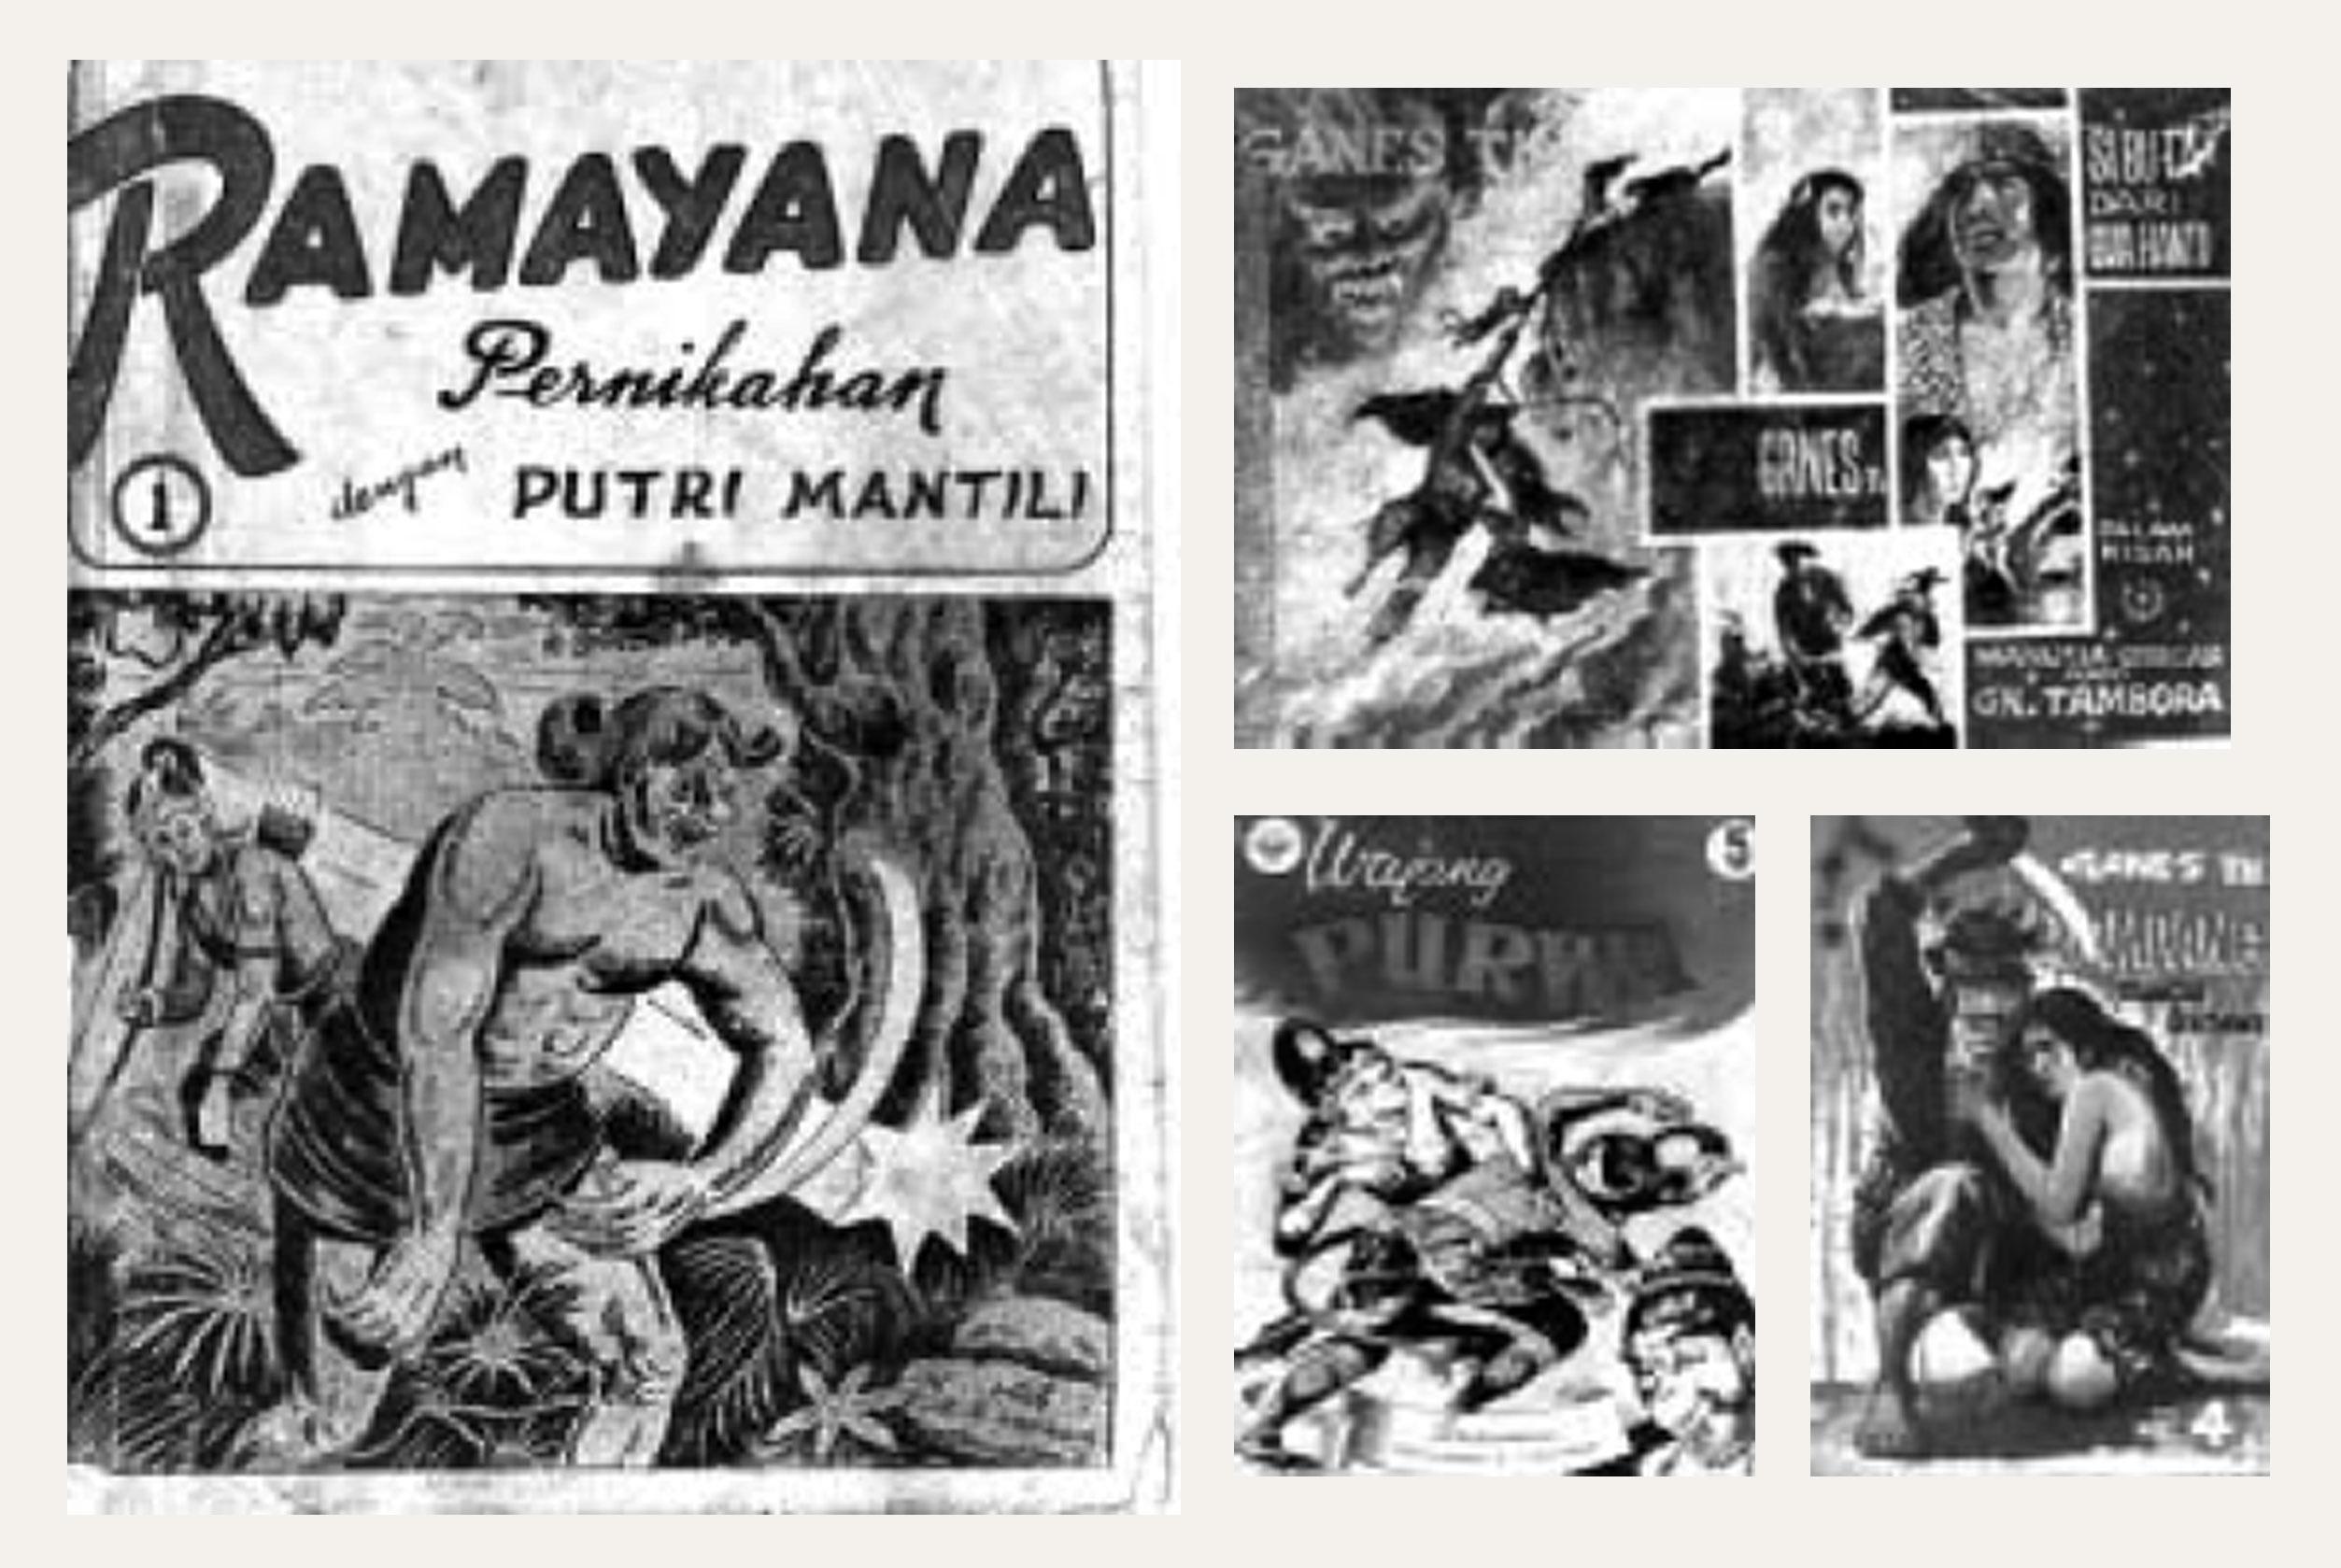 "Gambar 10. (a) Kulit muka buku cergam ""Ramayana"" karya RA.Kosasih tahun 1960- an diterbitkan oleh CV Melodi; (b) Kulit muka buku cergam ""Si Buta Dari Gua Hantu"" karya Ganes Th tahun 1969 diterbitkan oleh PT.RS; (c) Kulit muka buku cergam ""Wayang Purwa"" karya Ardisoma yang terbit tahun 1960-an; (d) Kulit muka cergam ""Si Djampang Jago Betawi"" karya Ganes Th. terbit tahun 1969."